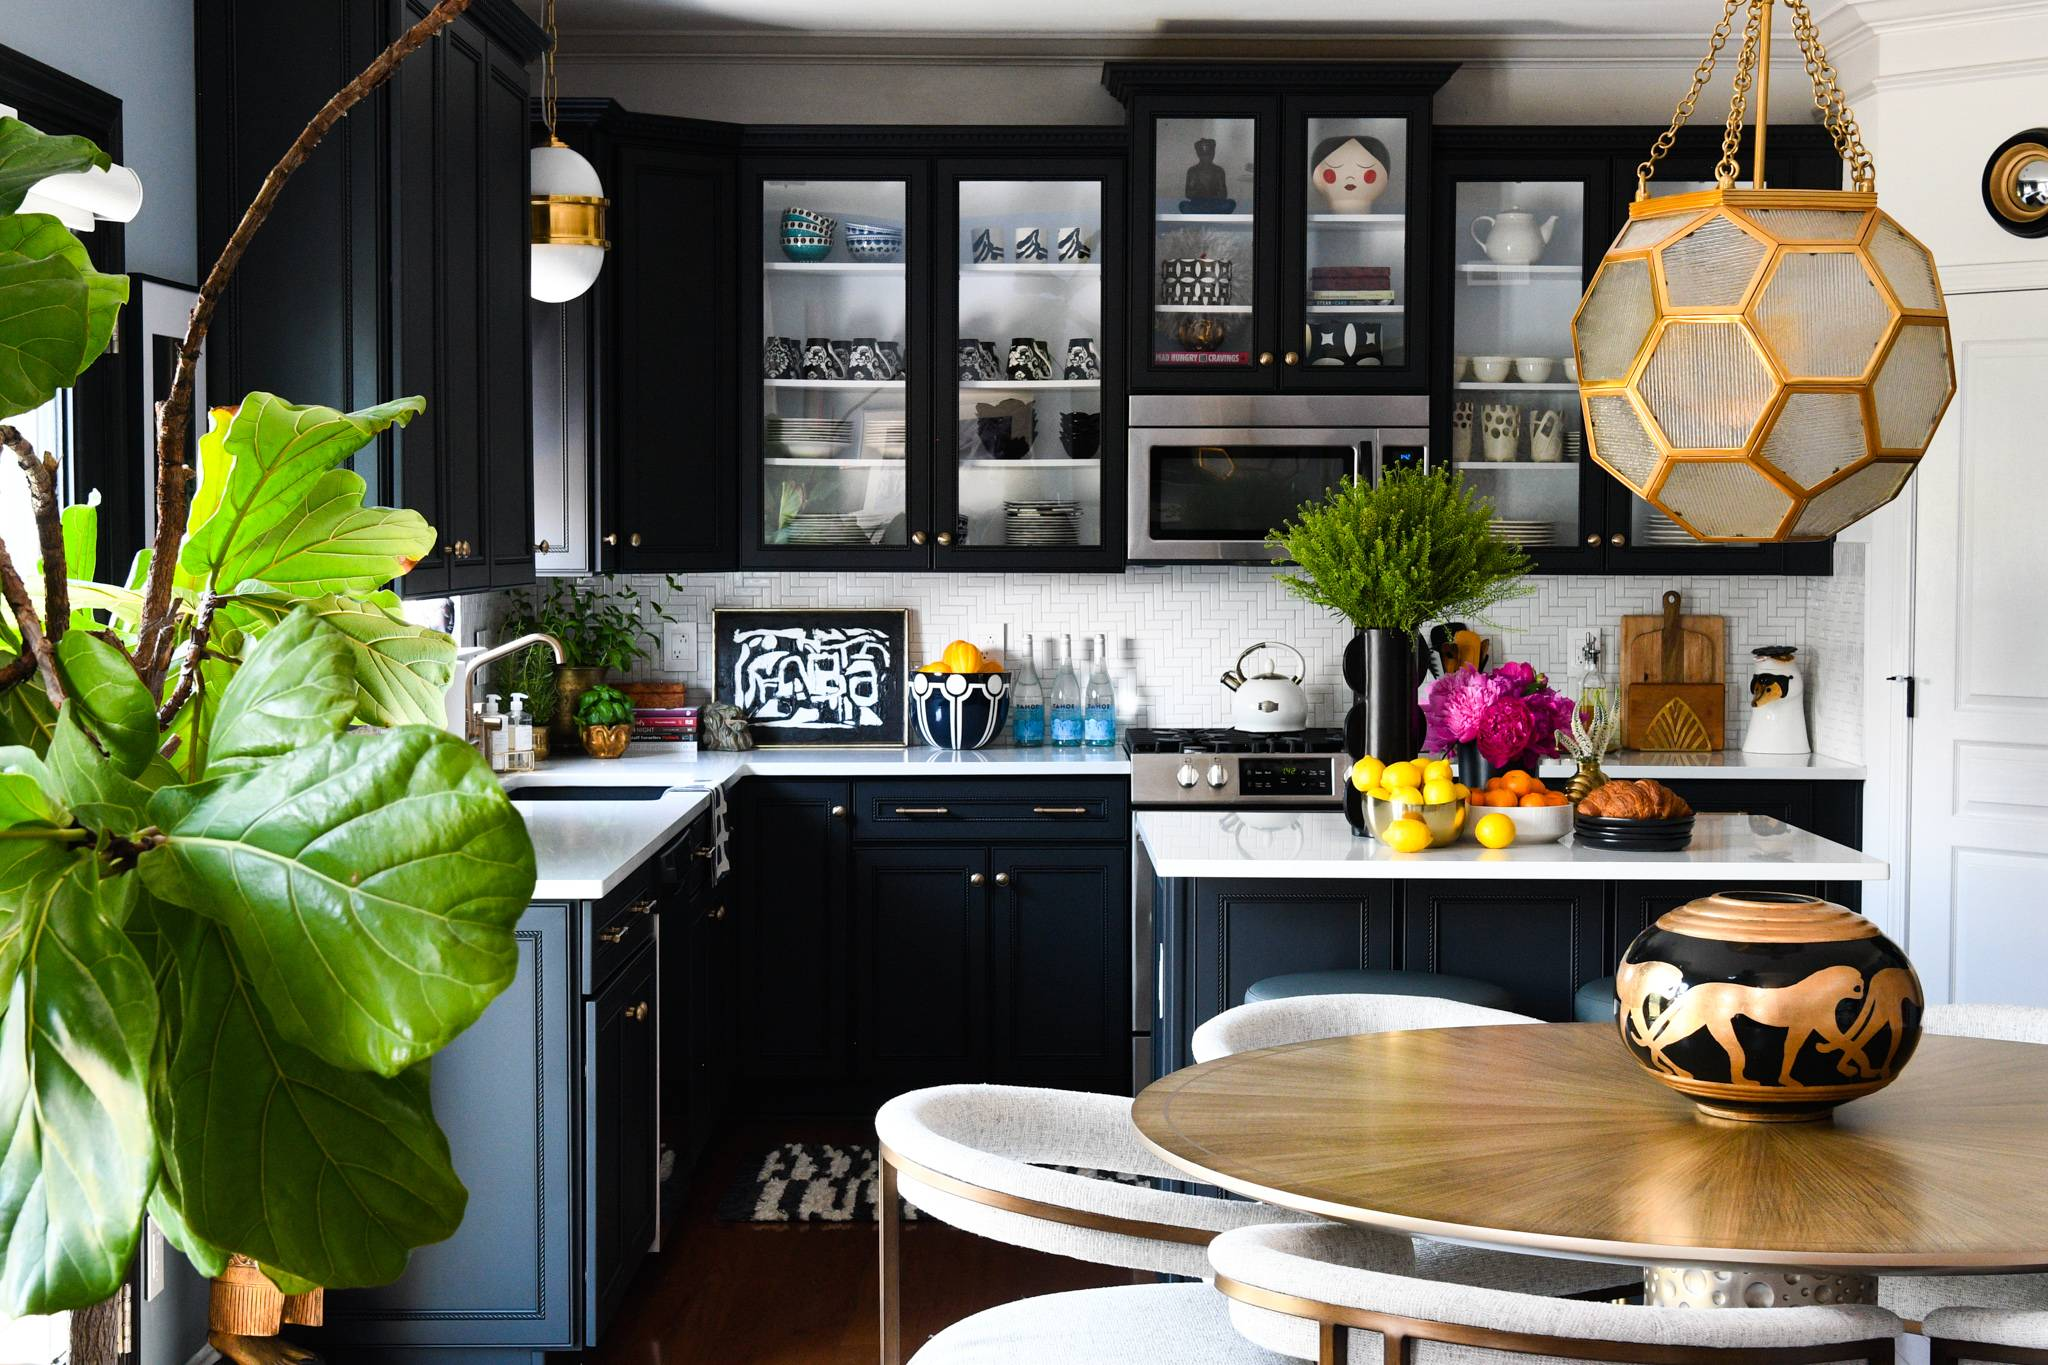 modern kitchen with black cabinets and white herringbone tiled backsplash